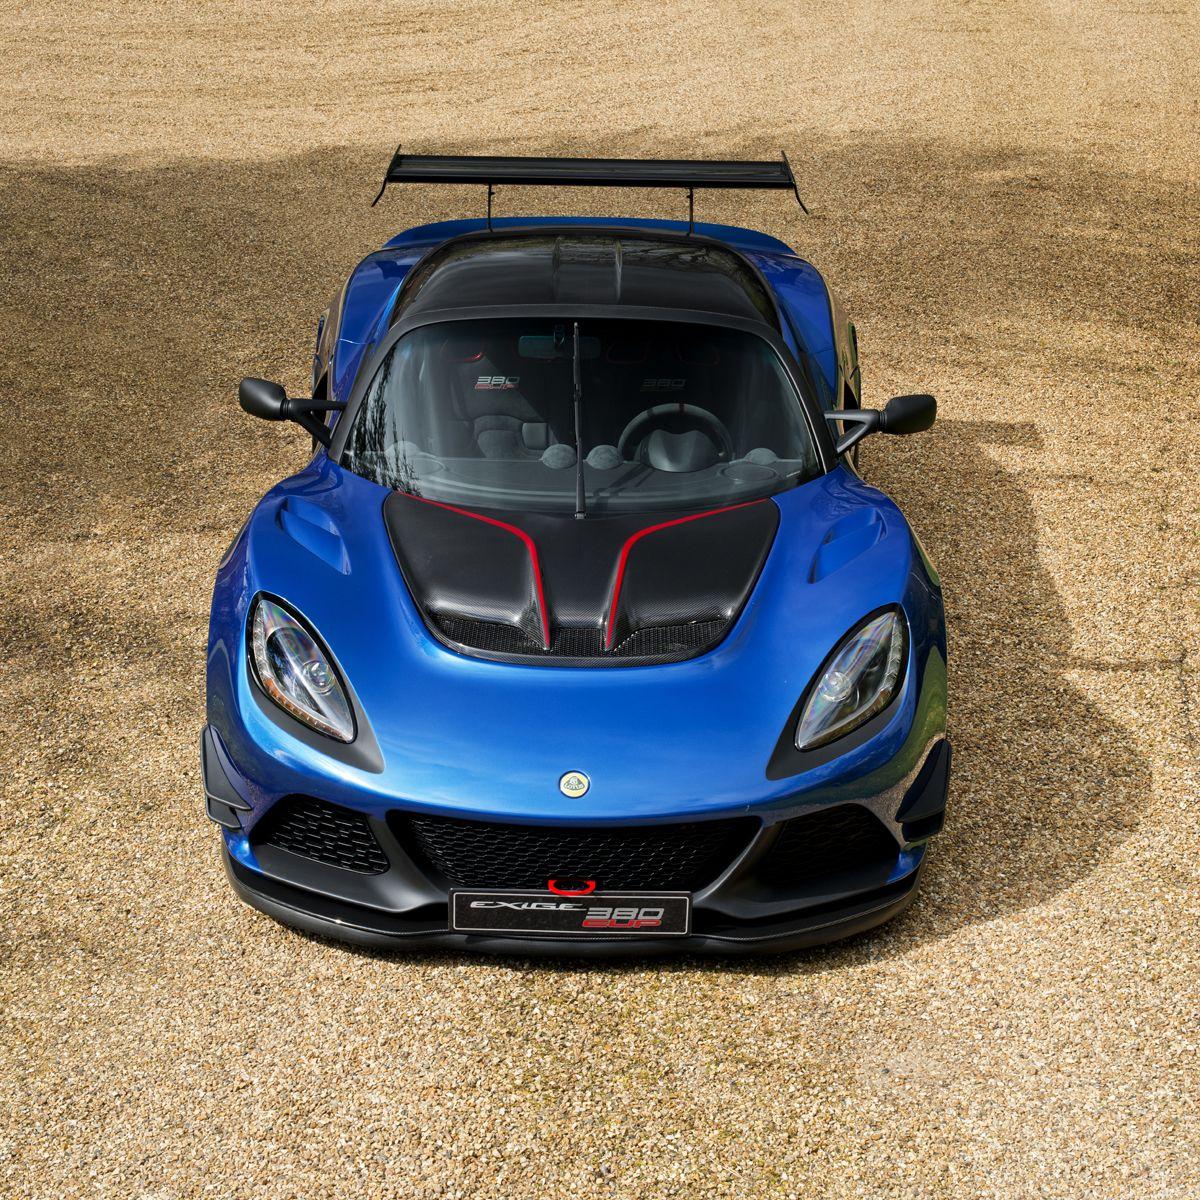 Lotus Exige, Lotus Car, Super Cars